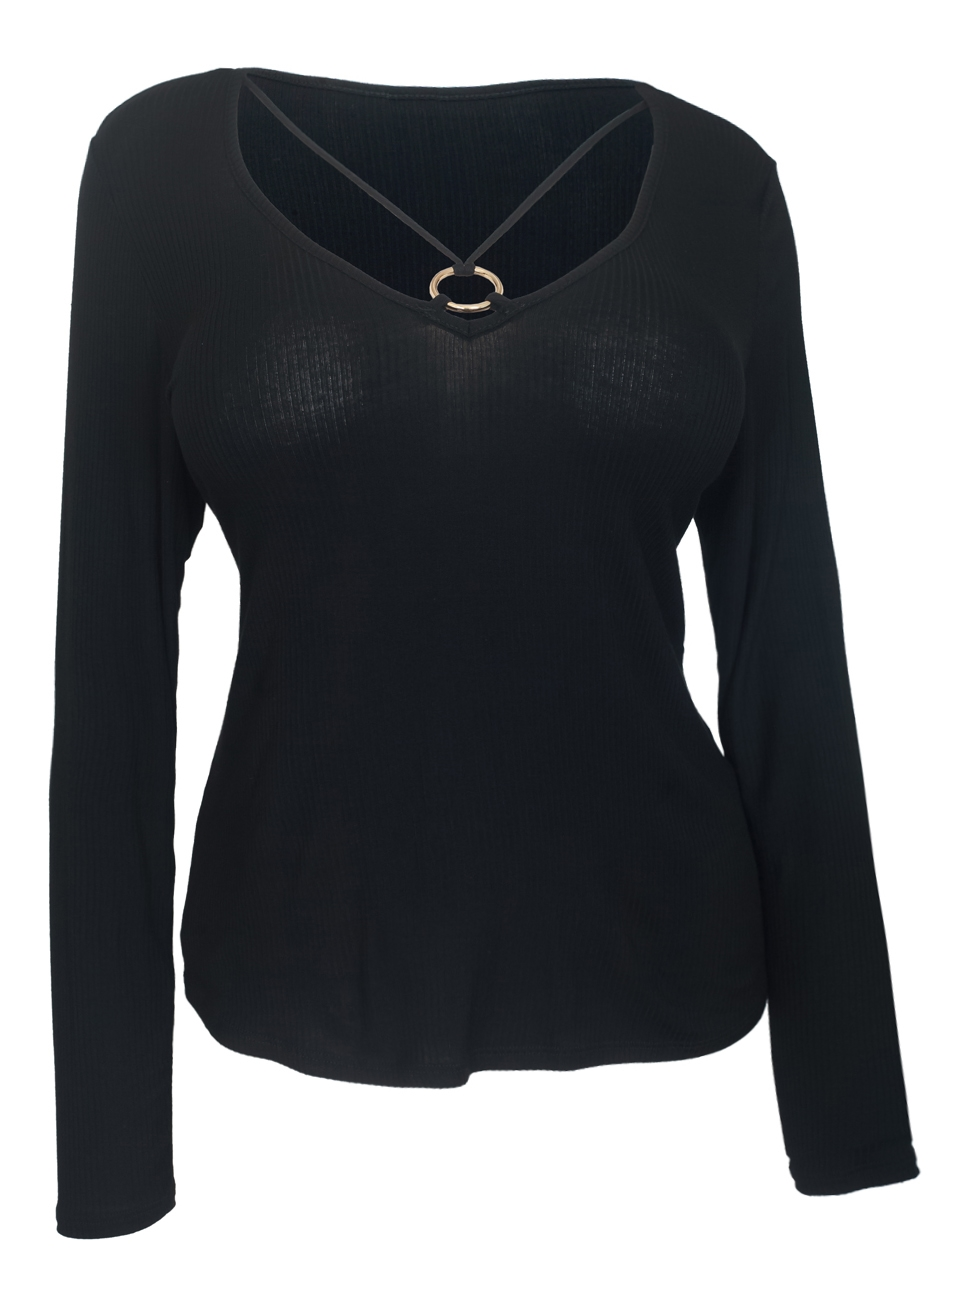 Women's O-ring Detail Long Sleeve Top Black